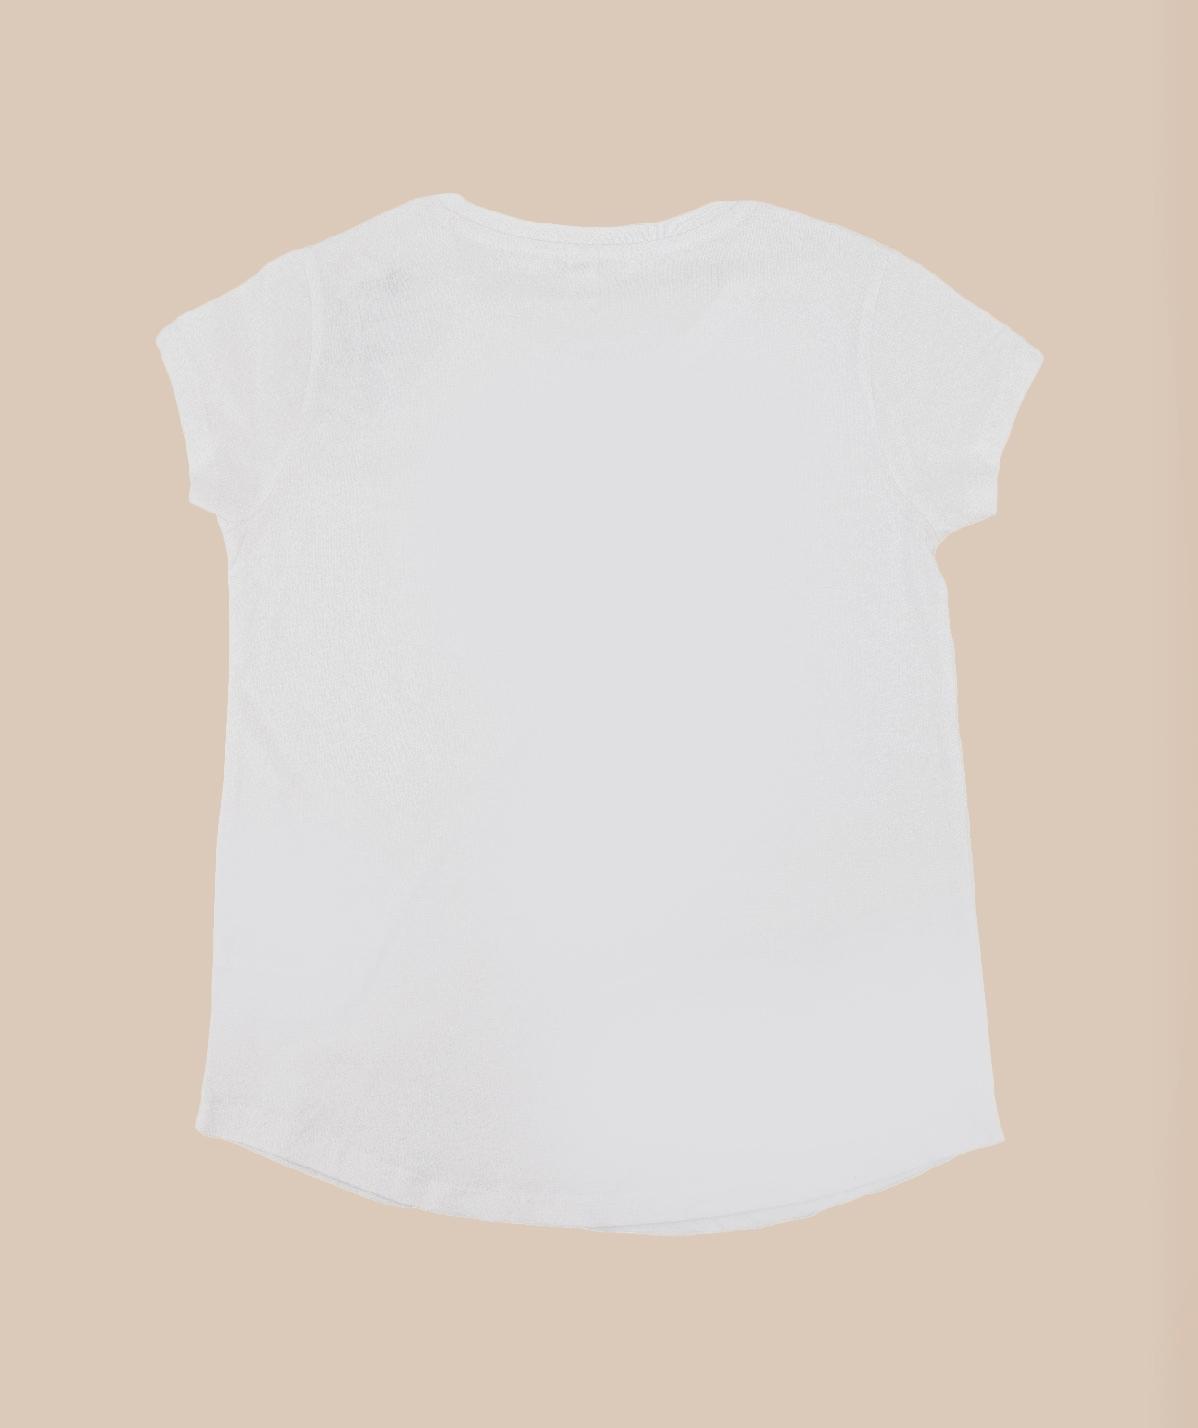 T-shirt Blanc Petite InShape logo Noir